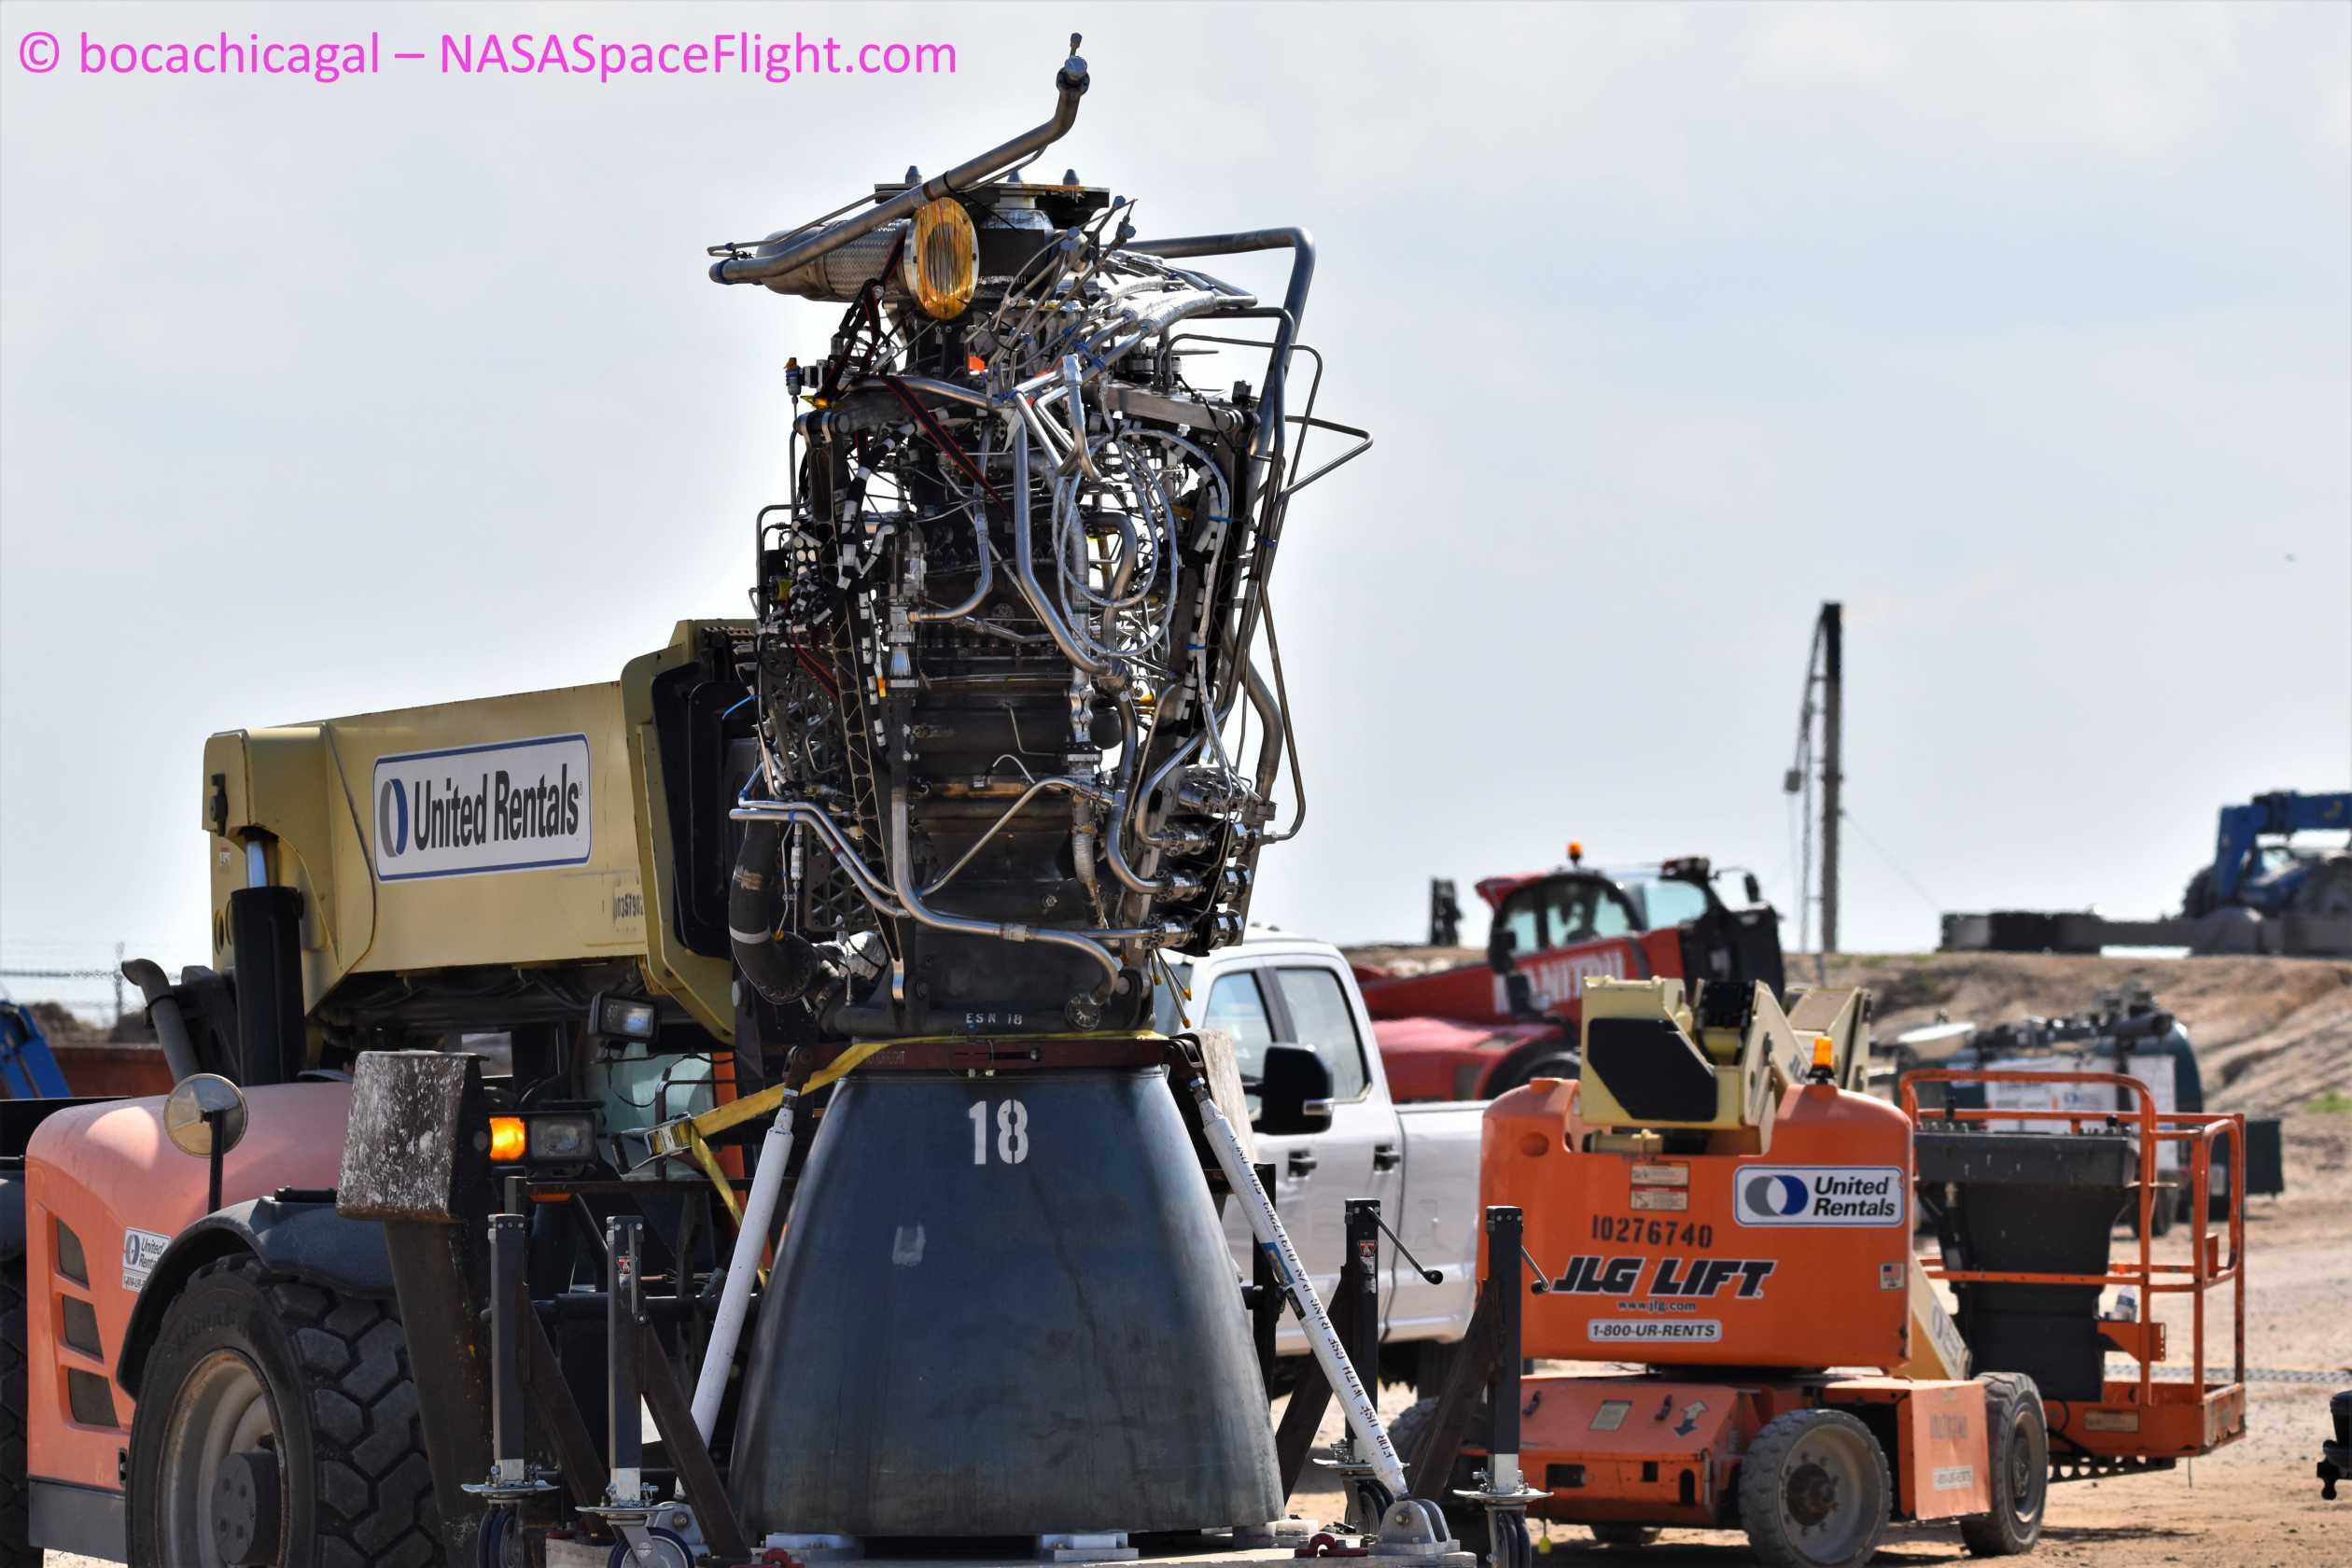 Starship Boca Chica 050720 (NASASpaceflight – bocachicagal) SN4 Raptor removal 5 (c)